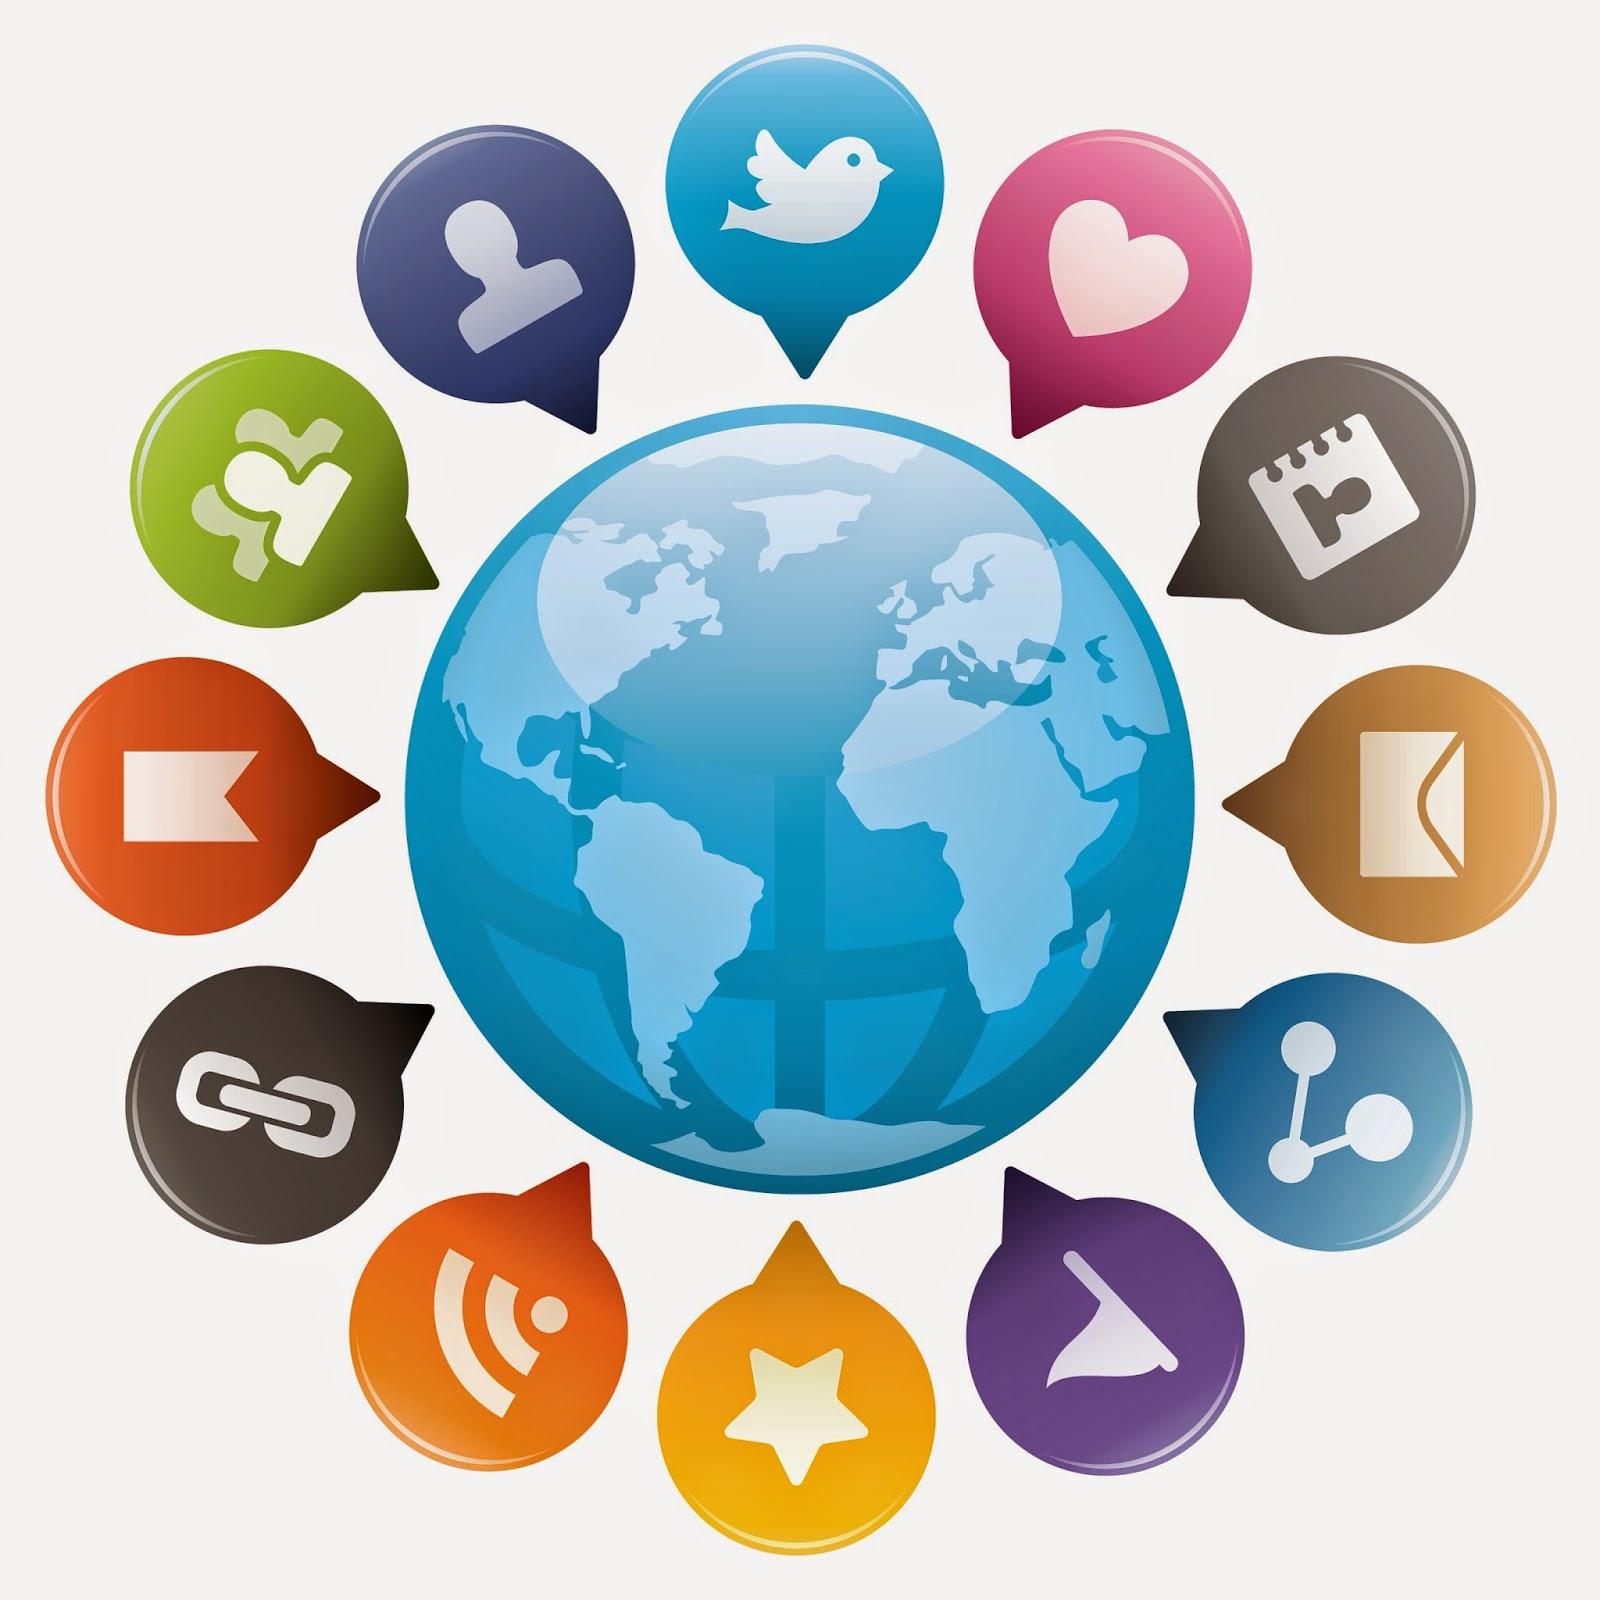 http://blogs.salleurl.edu/antiguos-alumnos/files/2014/03/redes-sociales1.jpg